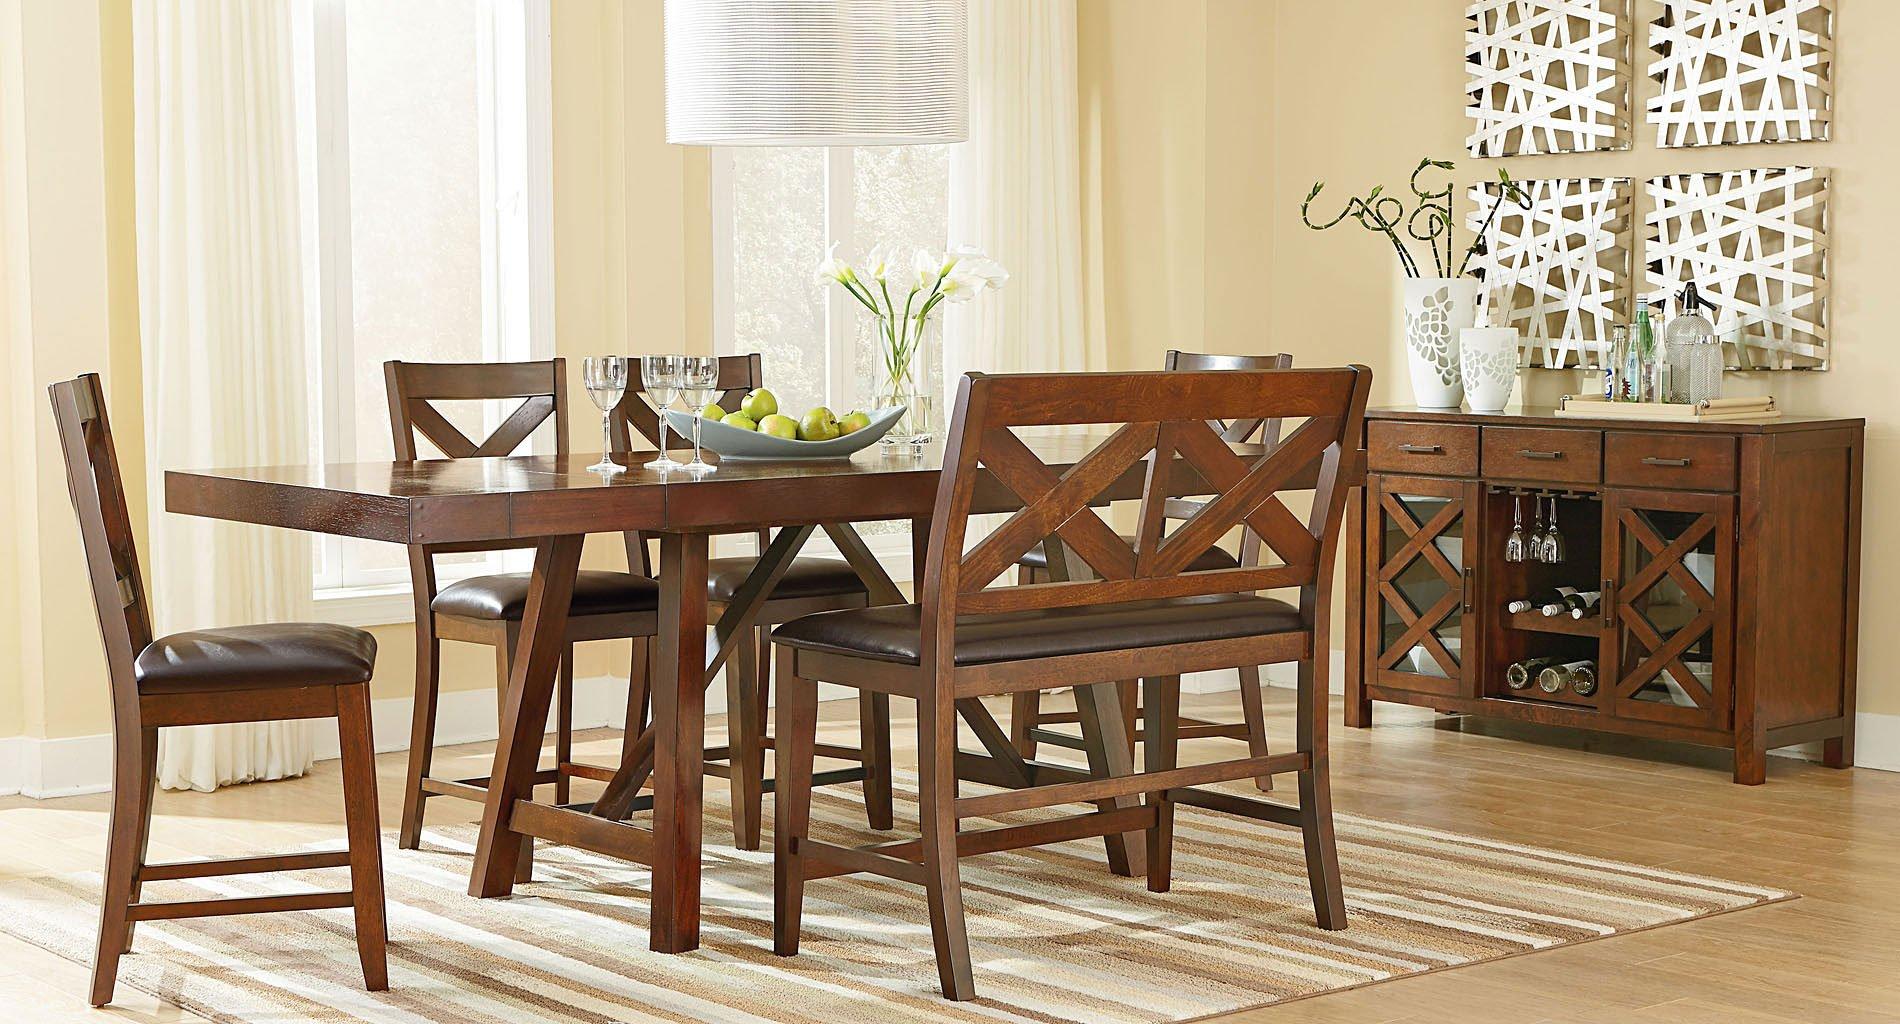 omaha counter height dining set w bench brown by standard furniture furniturepick. Black Bedroom Furniture Sets. Home Design Ideas